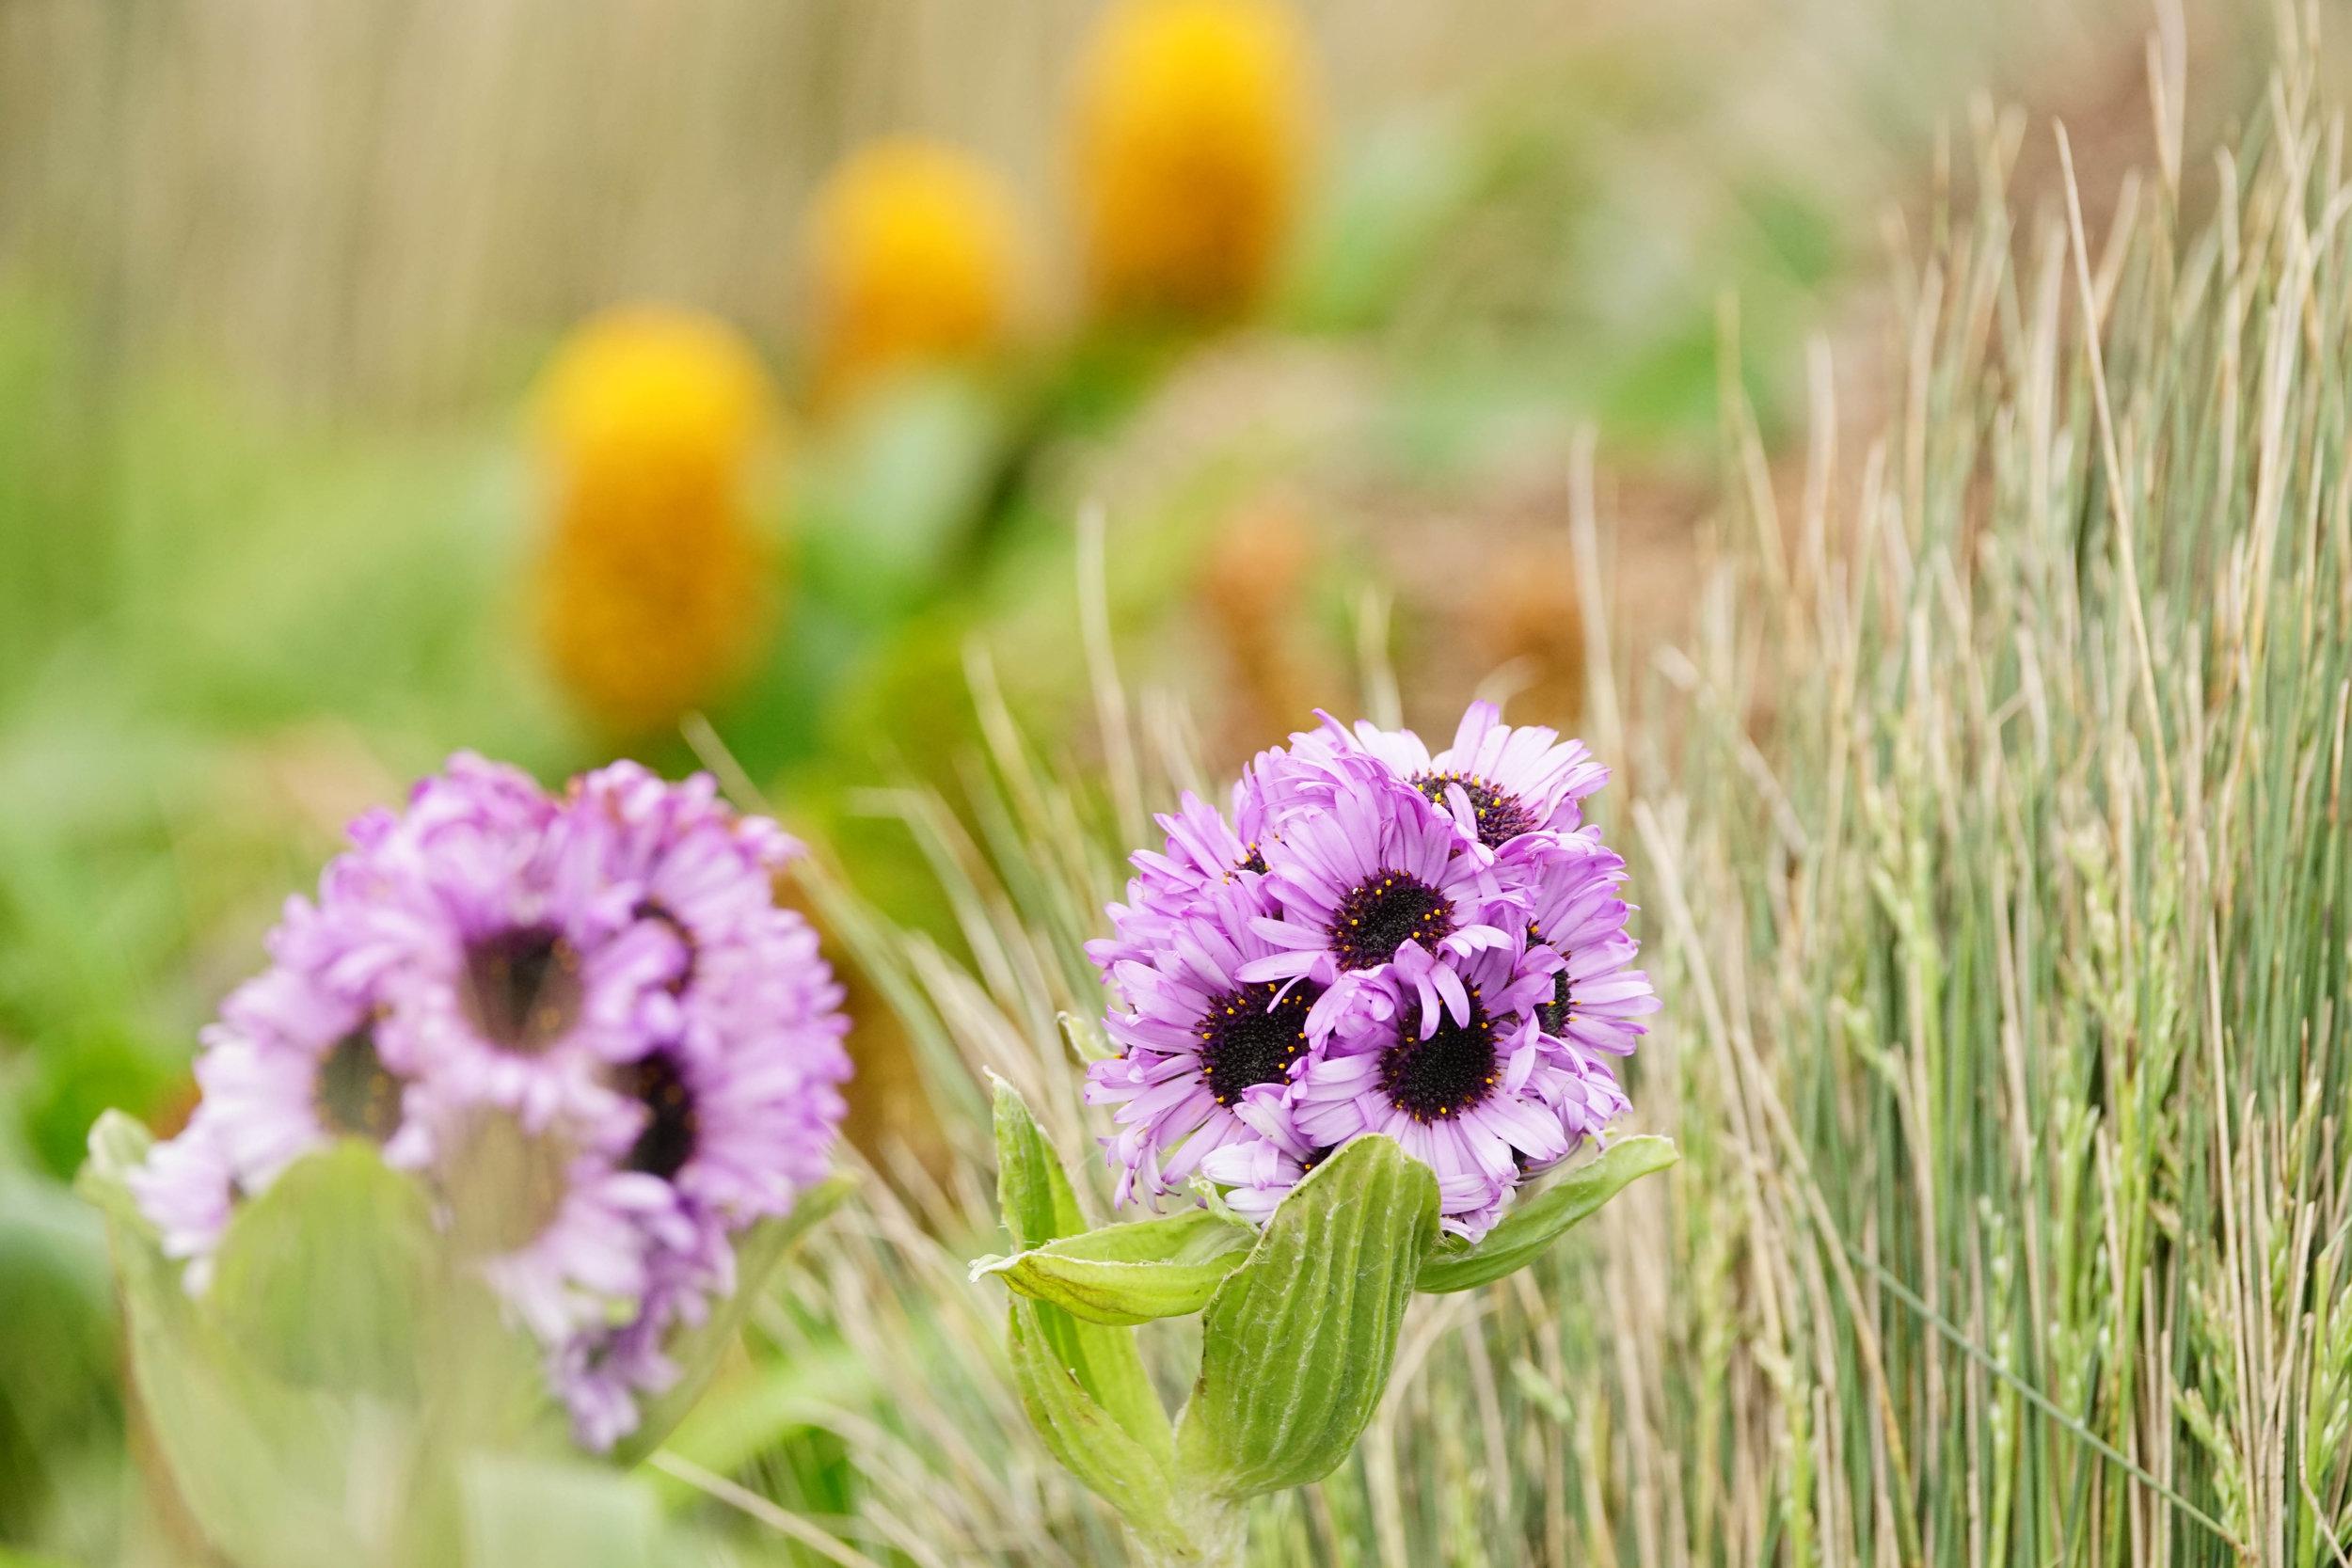 megaherbs are often in peak bloom in early January